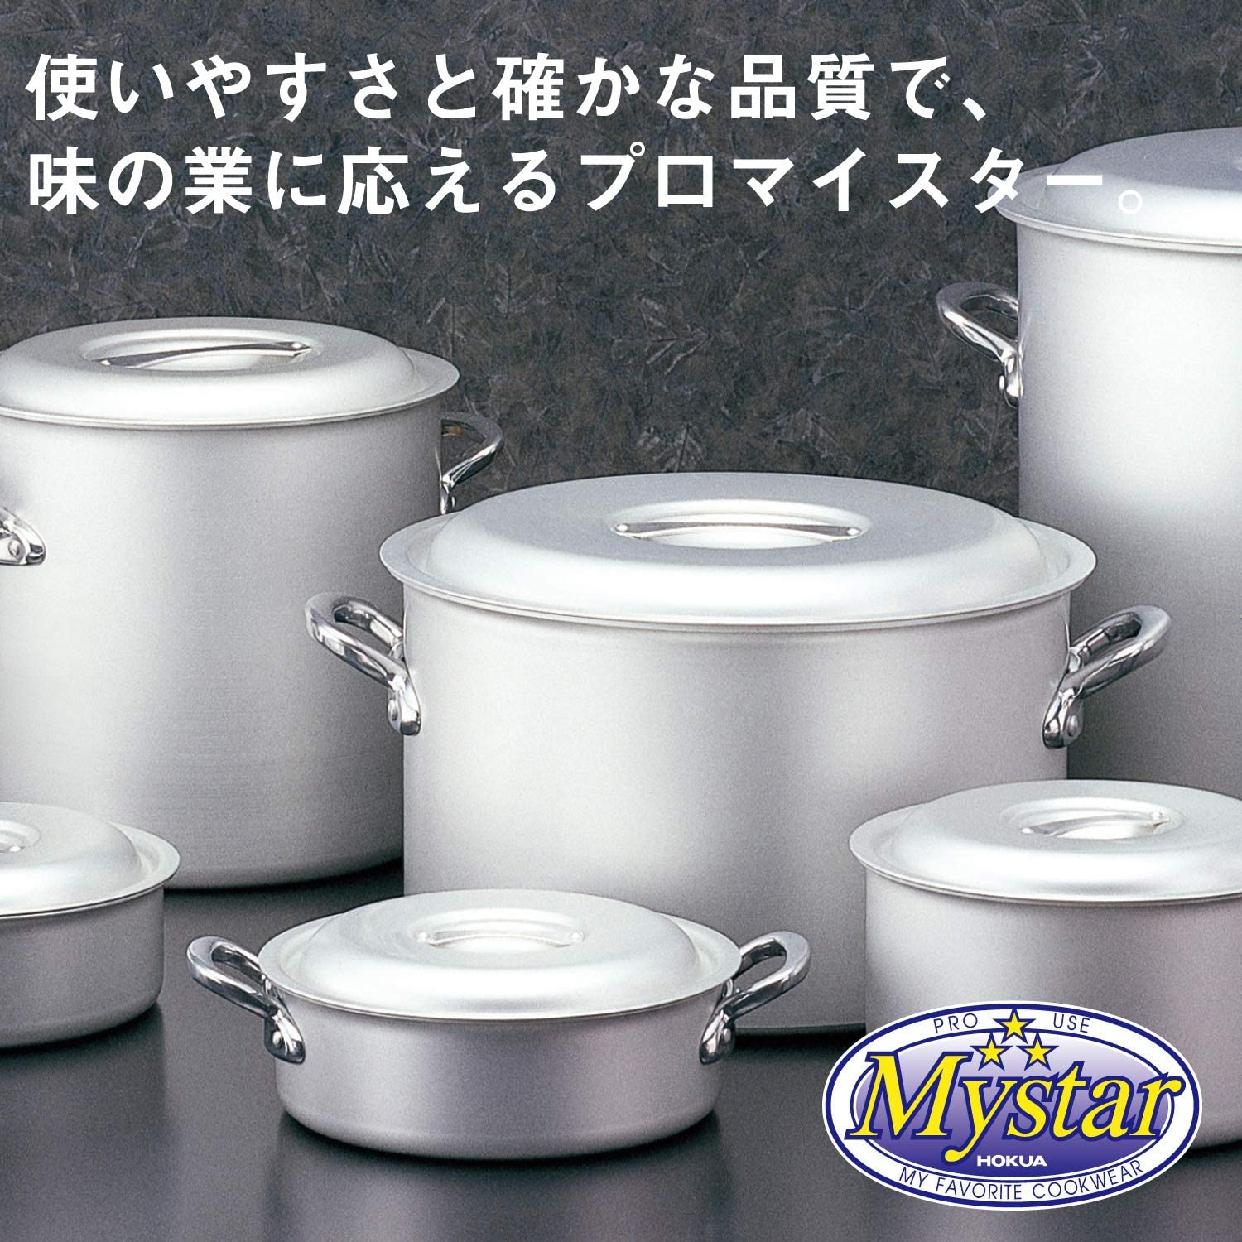 Pro Mister(プロマイスター) (業務用) 半寸胴鍋 18cm AHV5718の商品画像5